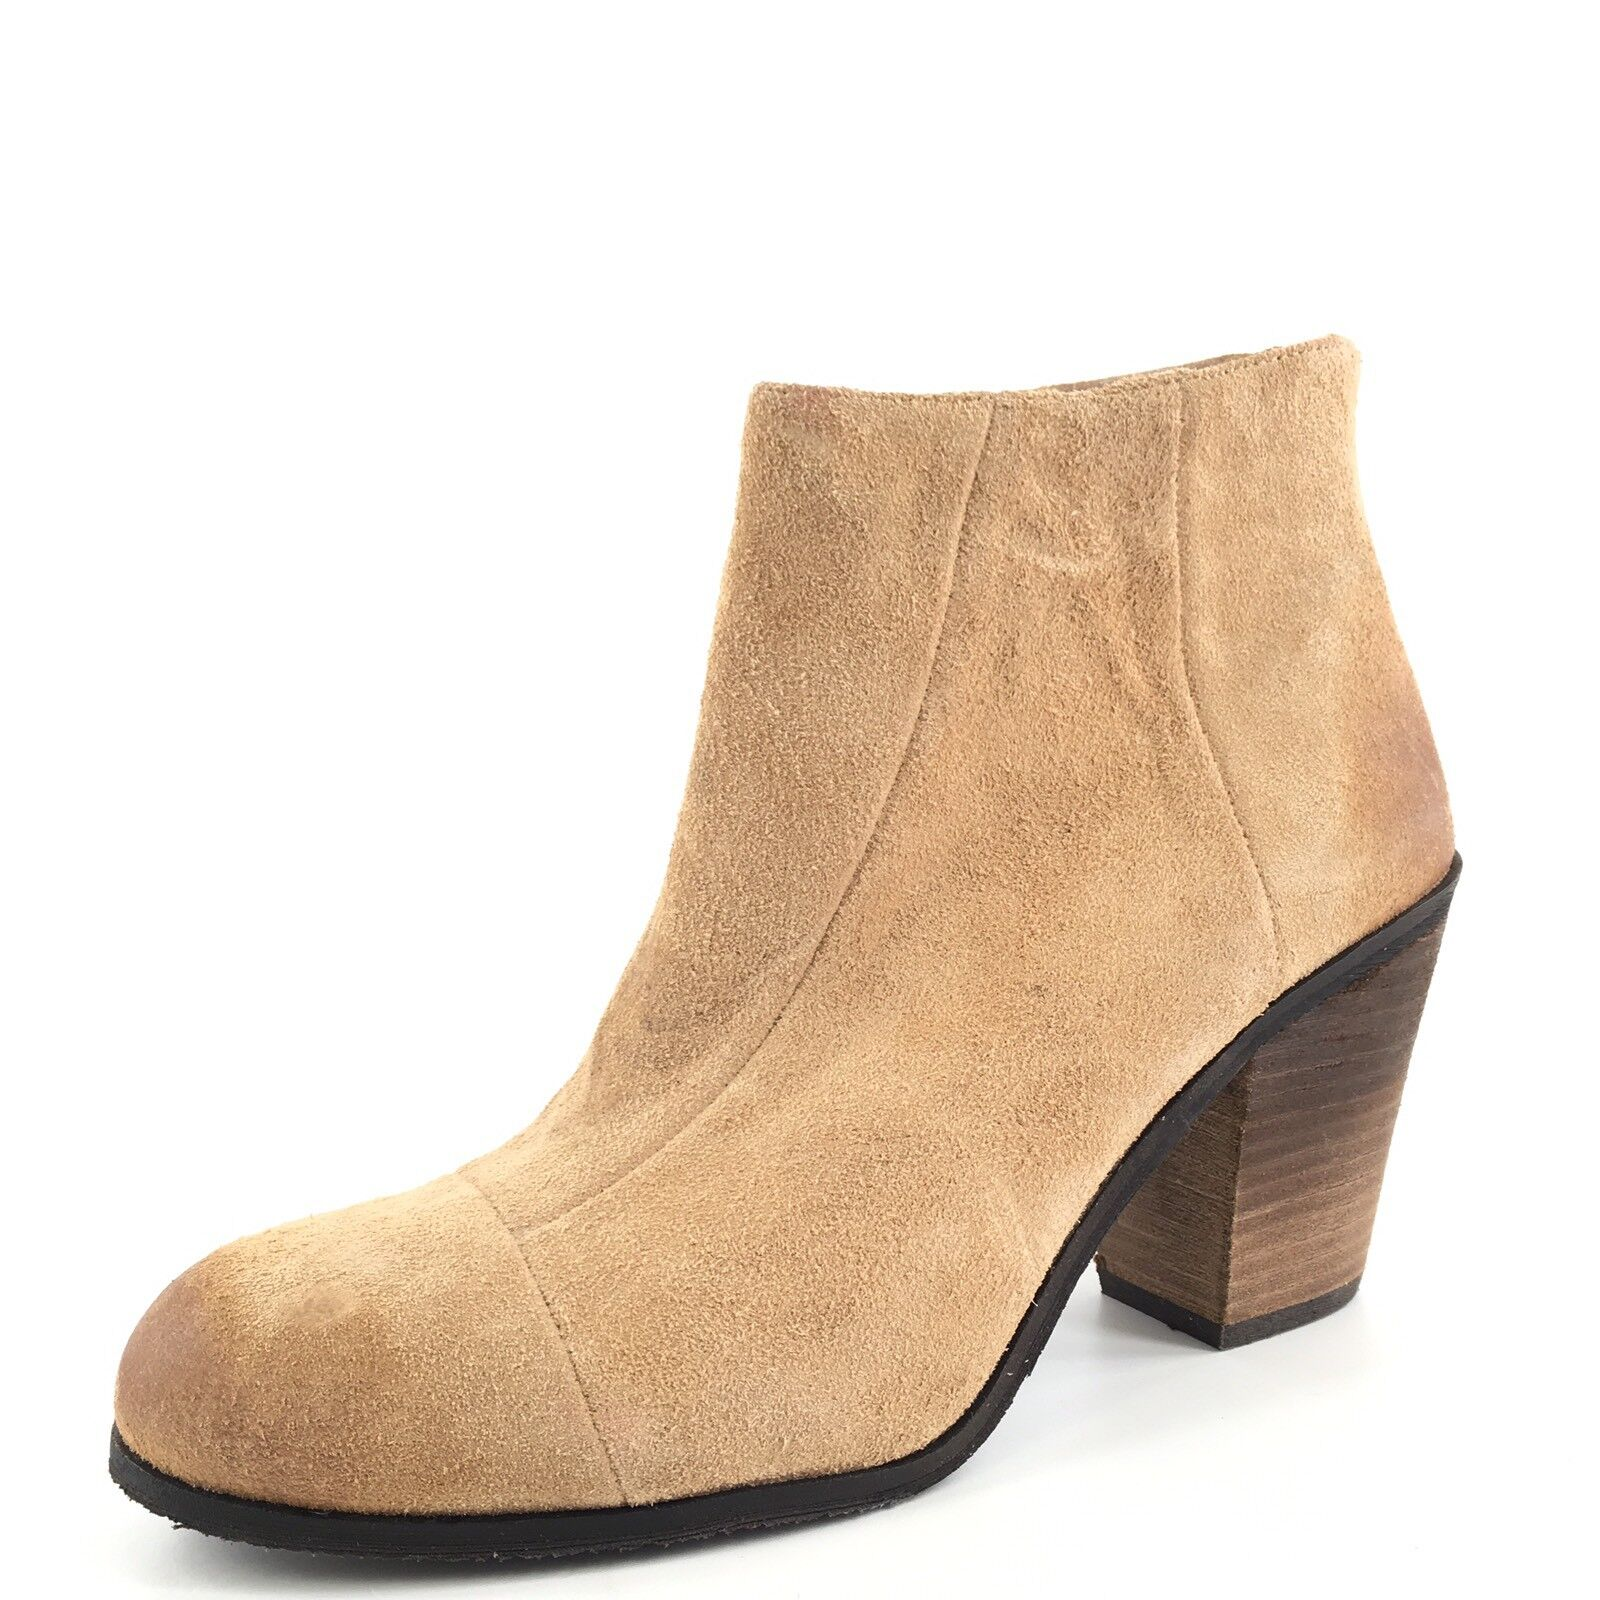 NEU Vince Camuto Graysen Bamboo Suede Ankle Booties Damenschuhe Größe 8.5 M